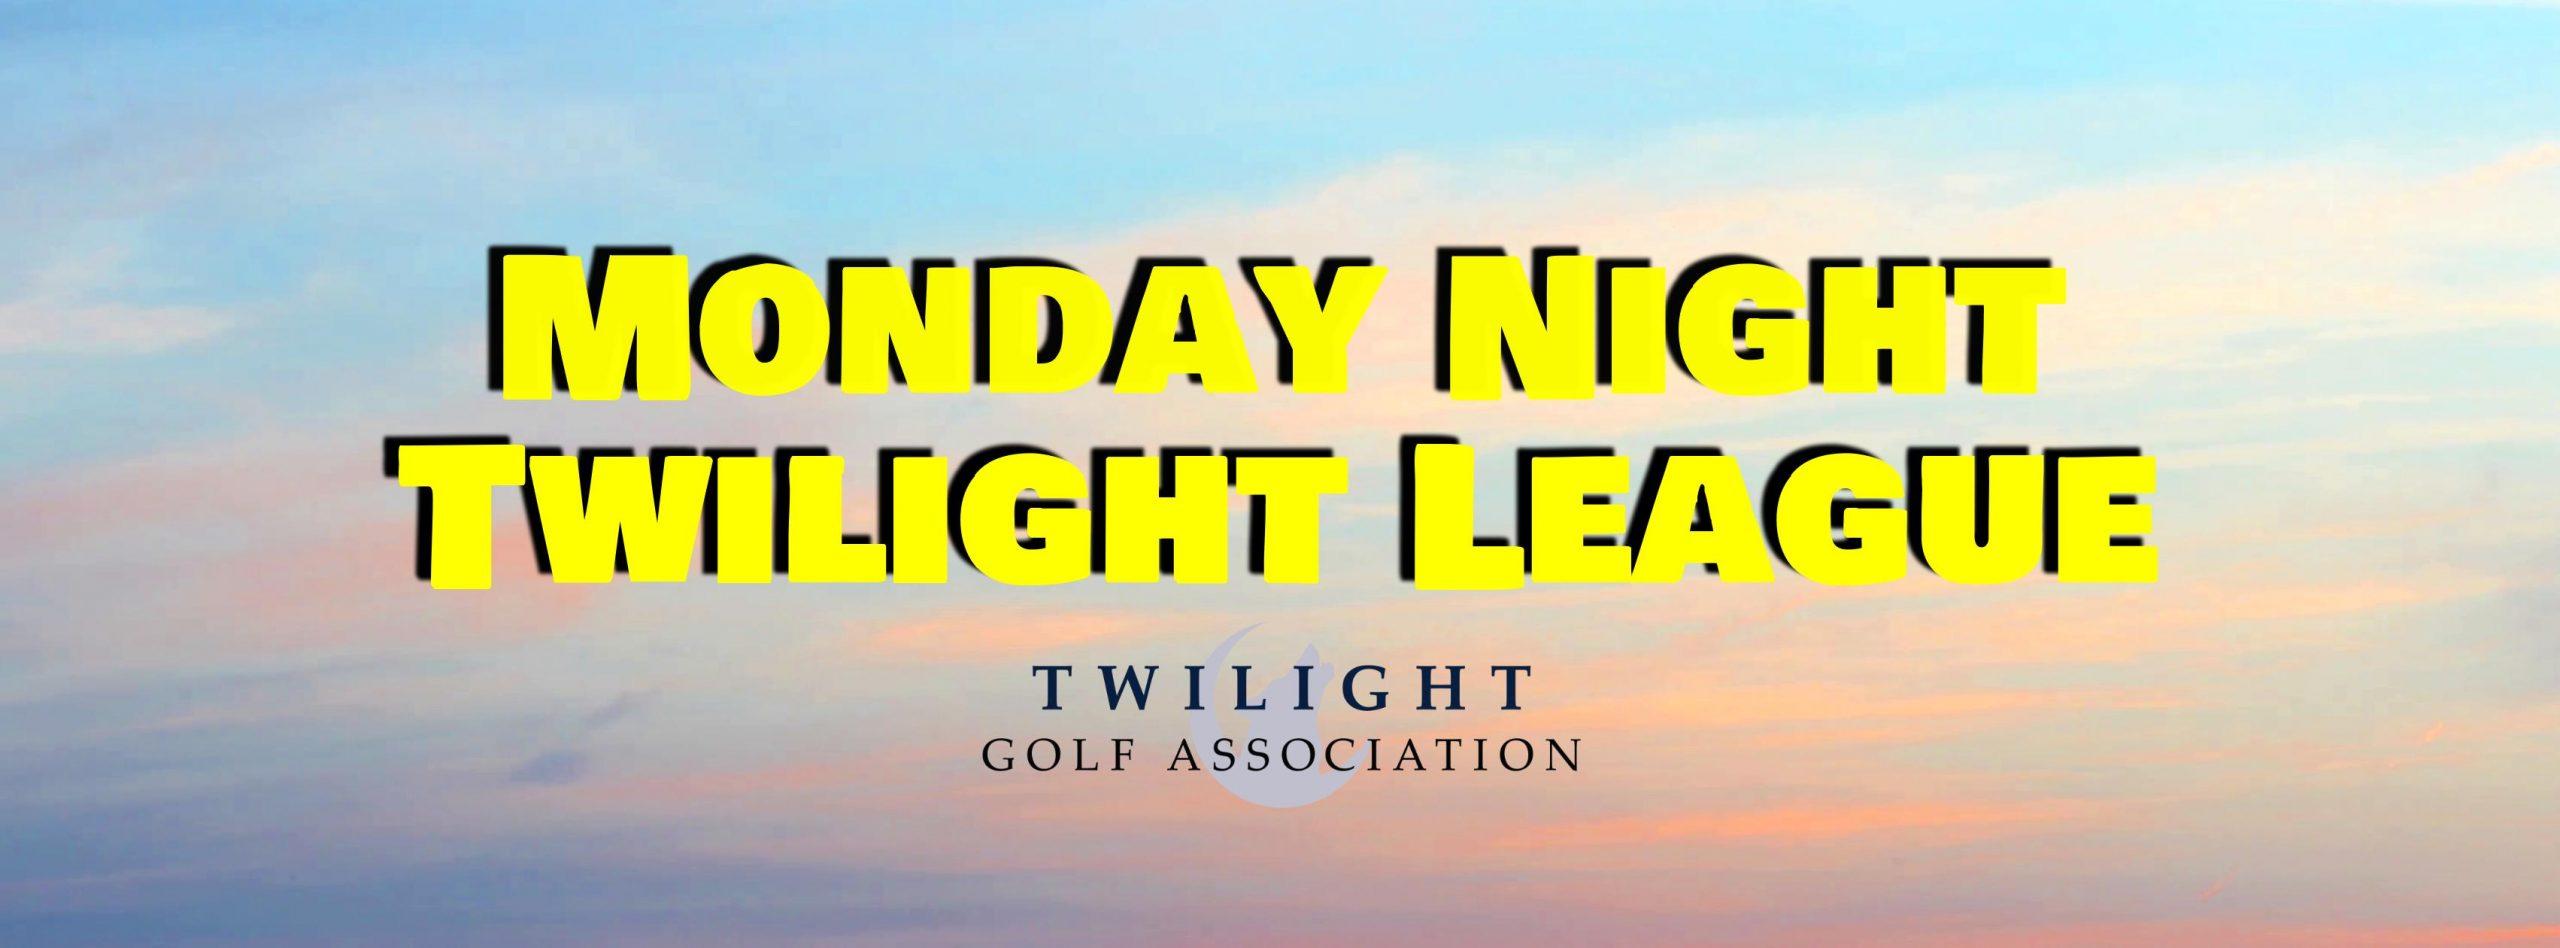 Monday Night Twilight League at Hilliard Lakes Golf Course